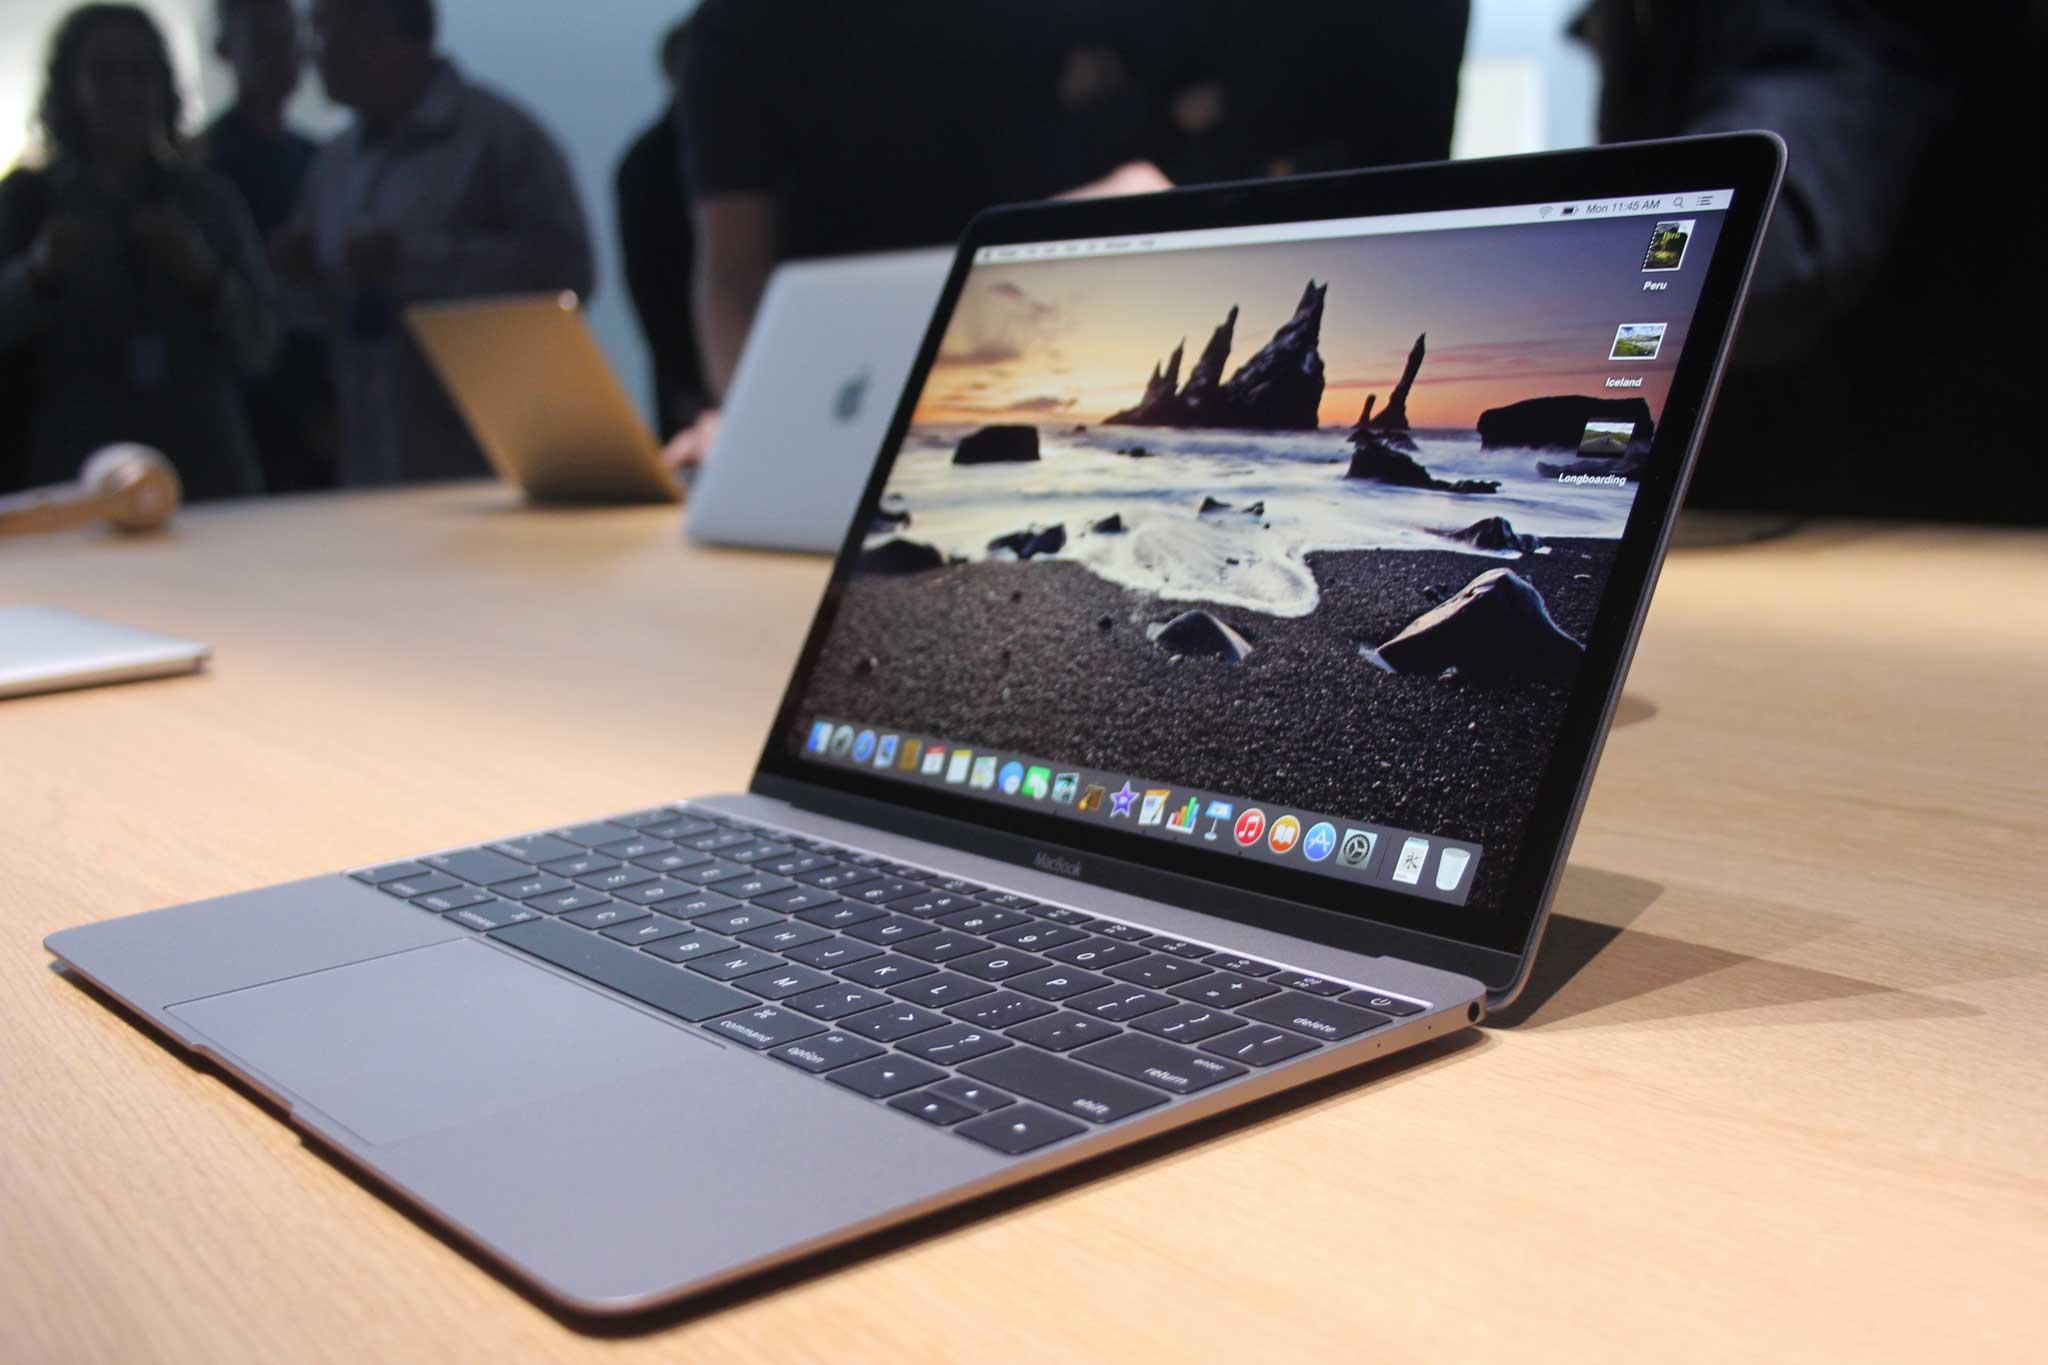 macbook-portss